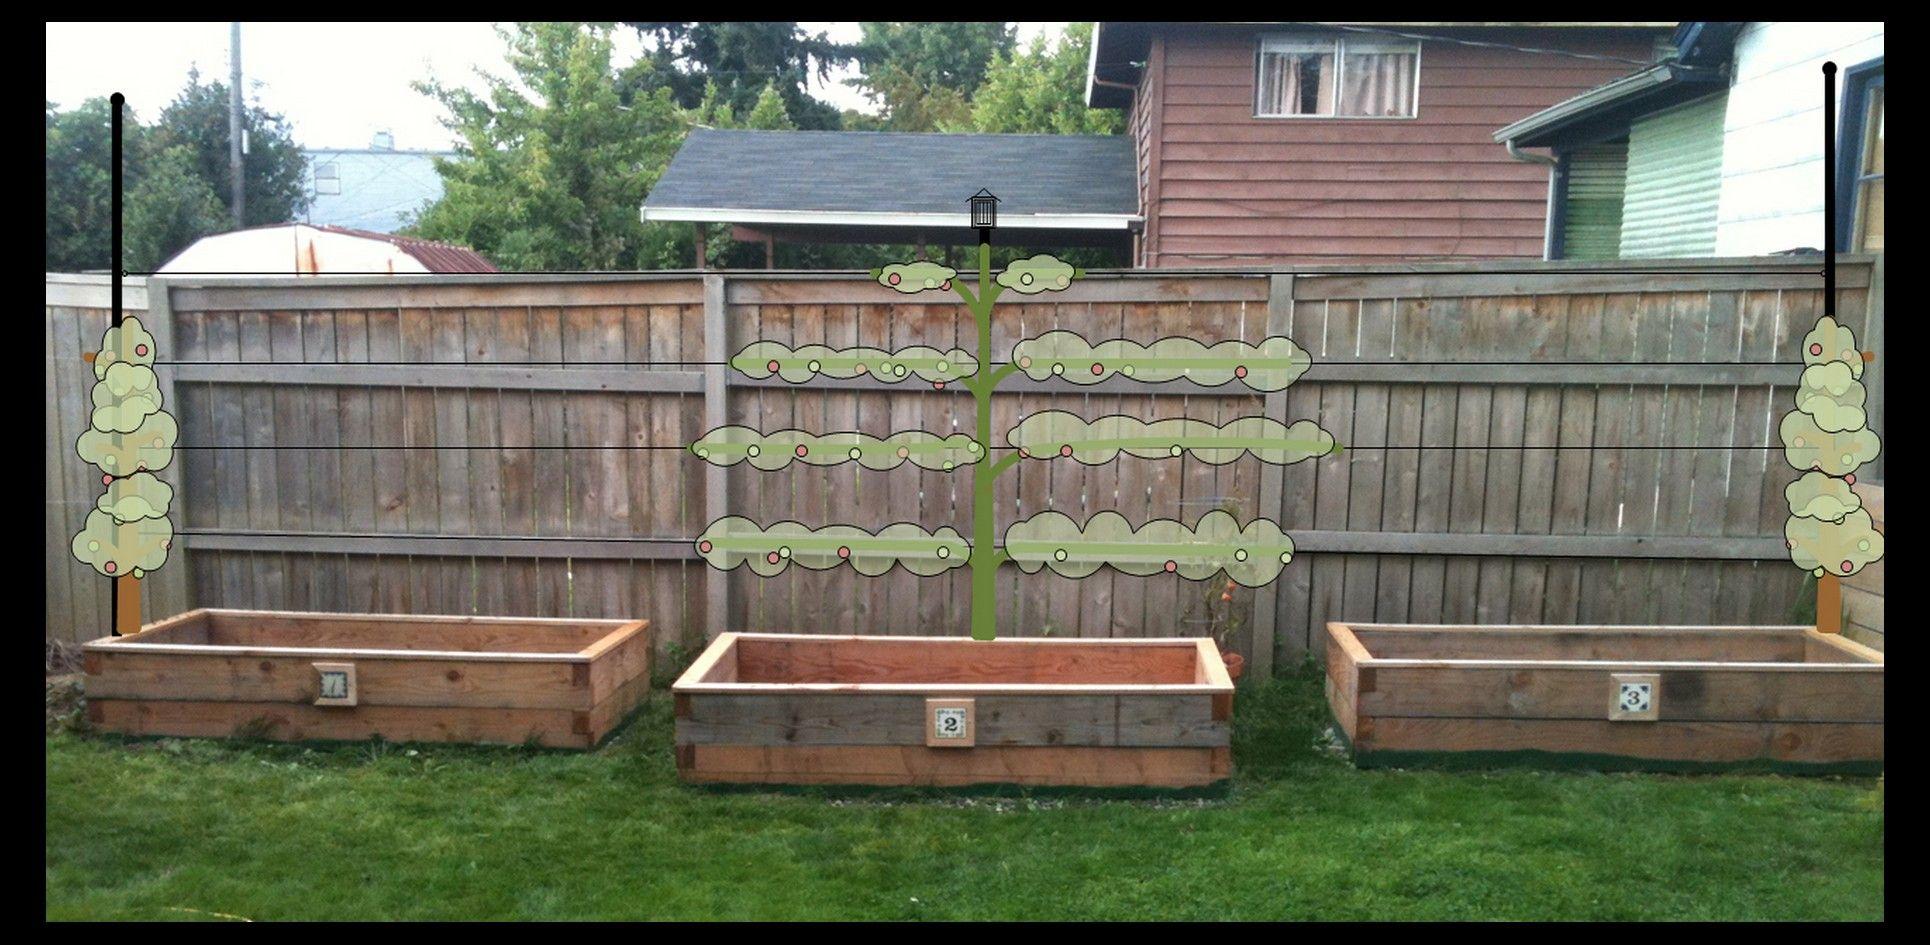 Medium Crop Of Fence Garden Planters